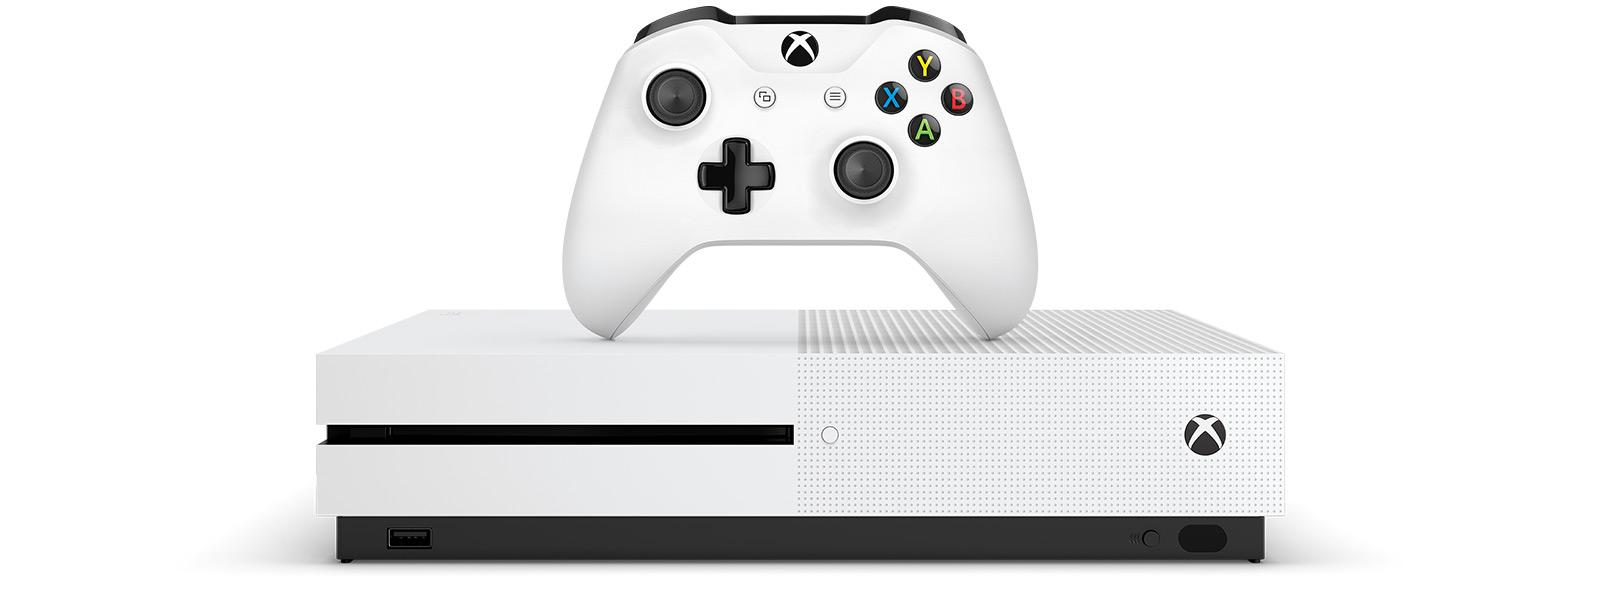 Aluguel de Xbox One S